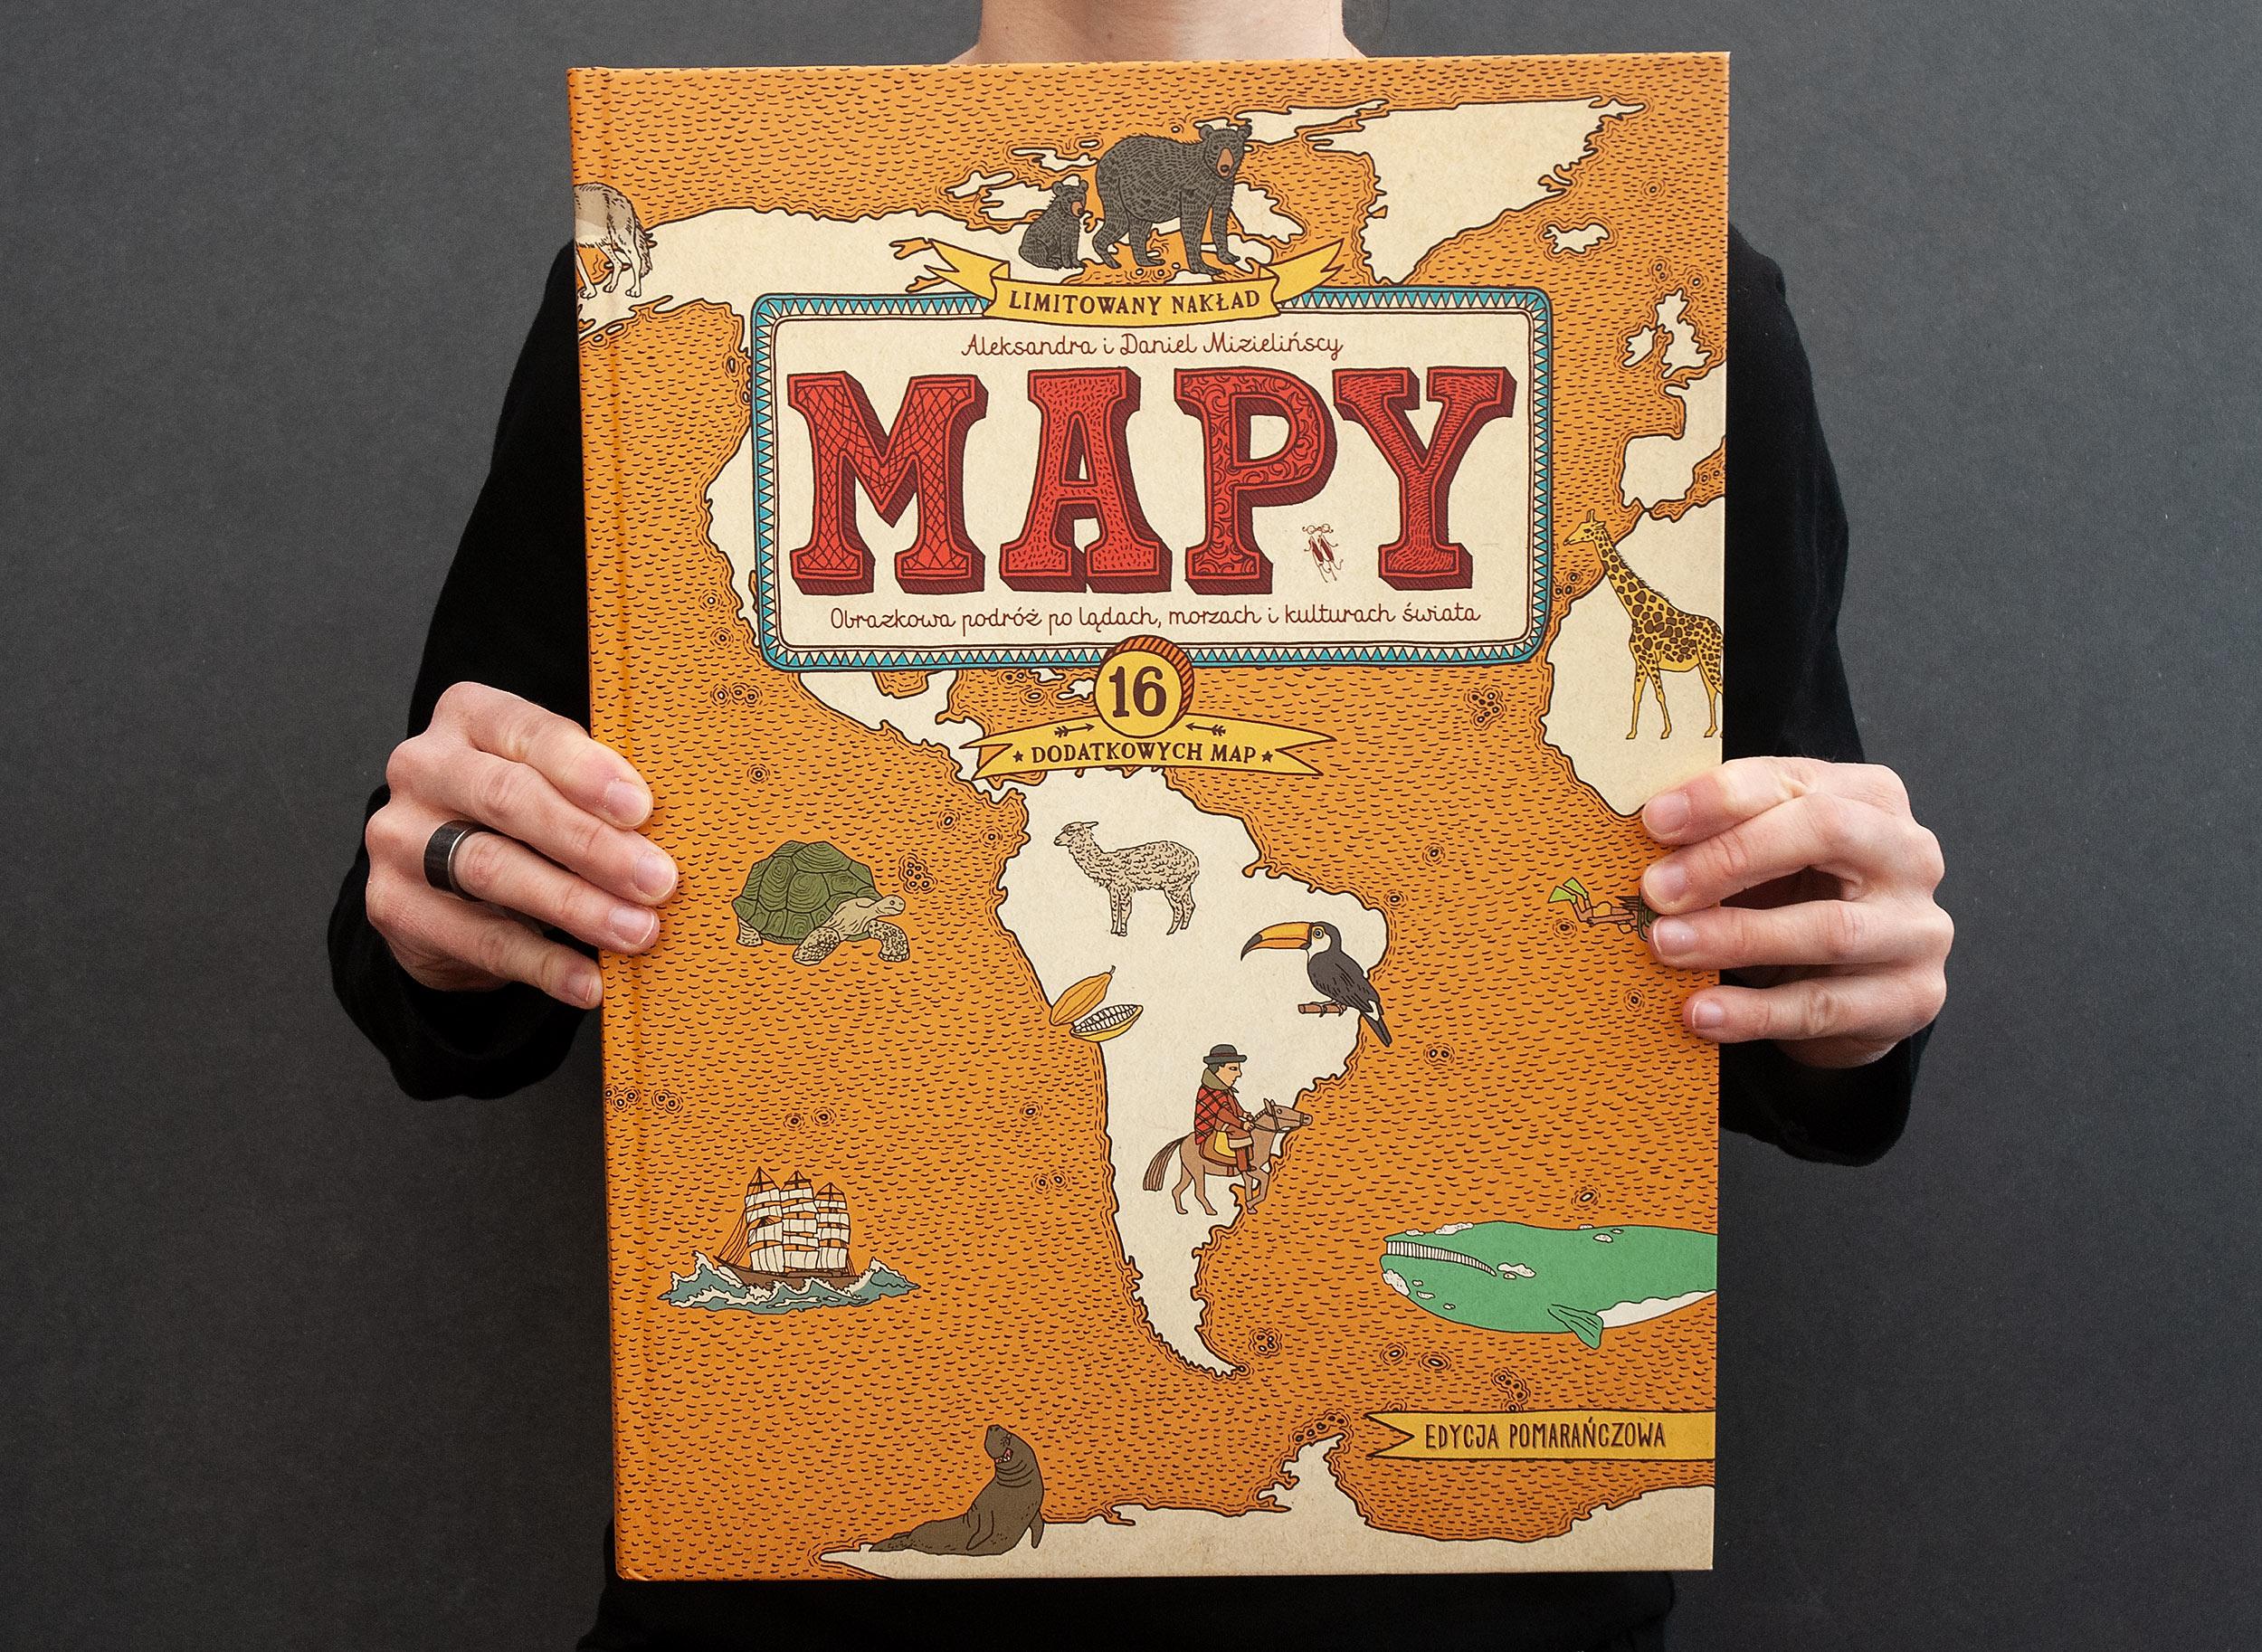 mapy-pomaranczowe-cover.jpg